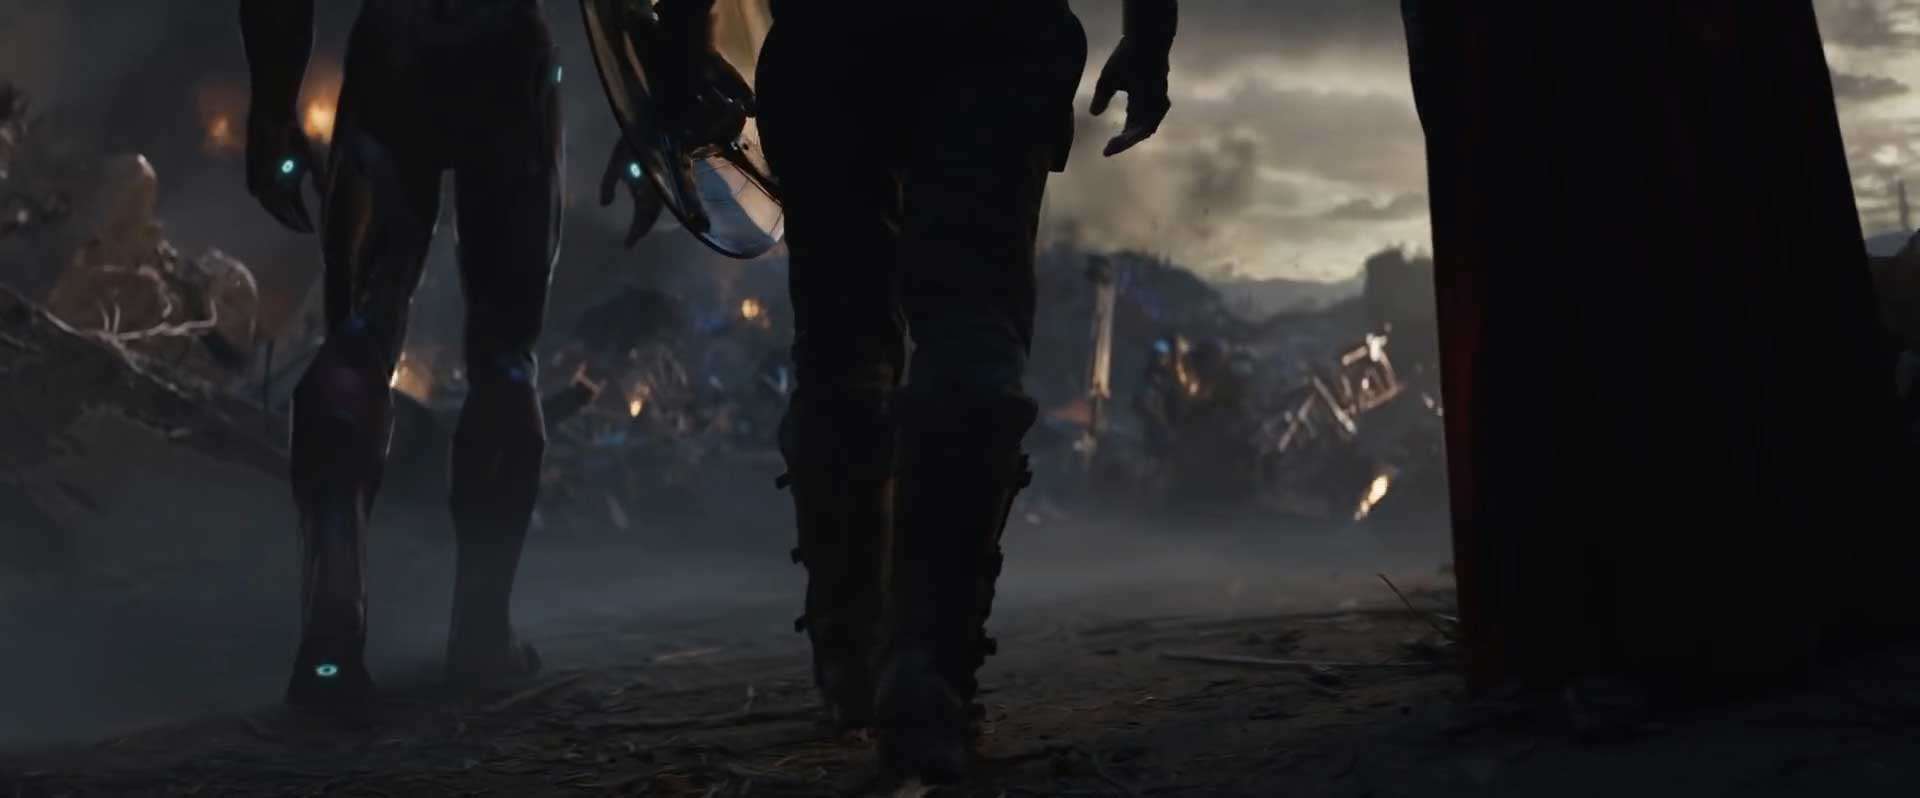 Avengers Endgame Special Look Trailer Breakdown - Iron Man Captain America Thor vs Thanos